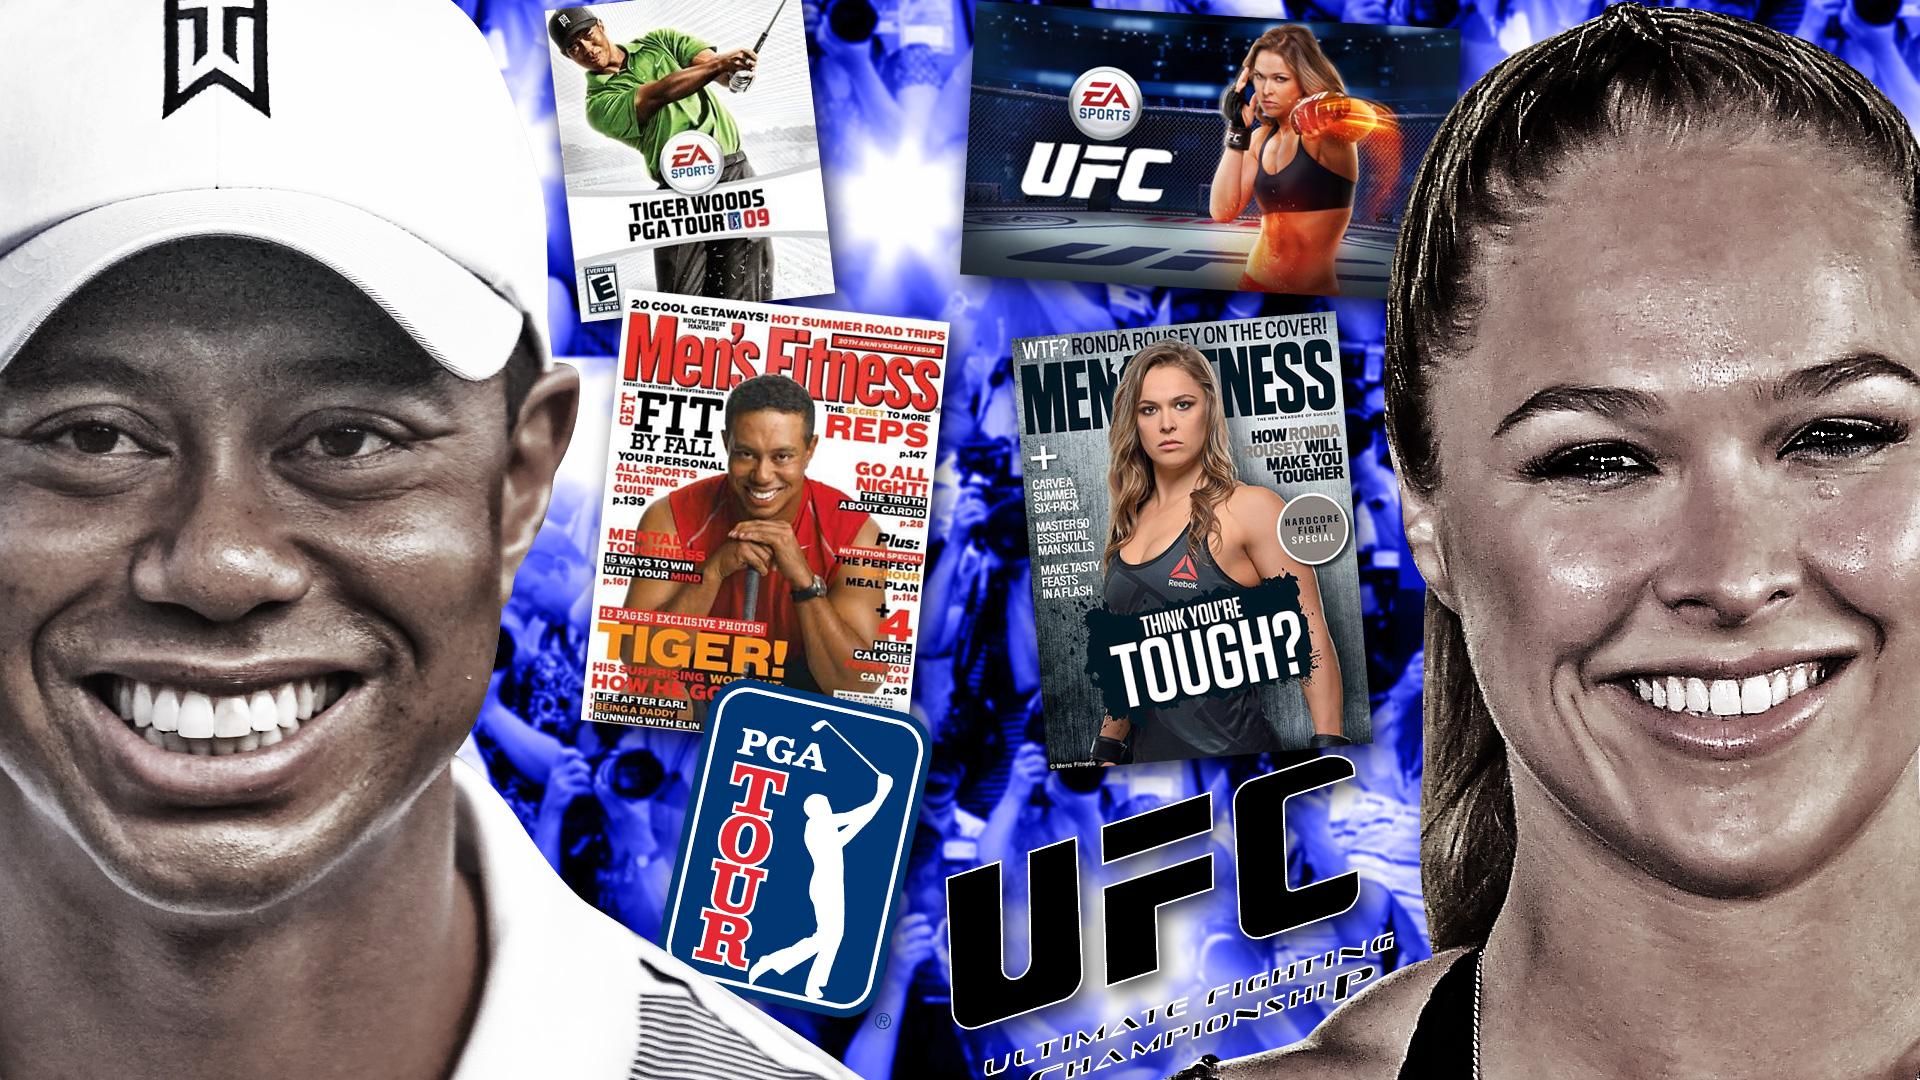 ILLO-Tiger-Woods-Ronda-Rousey-111115-GETTY-FTR.jpg